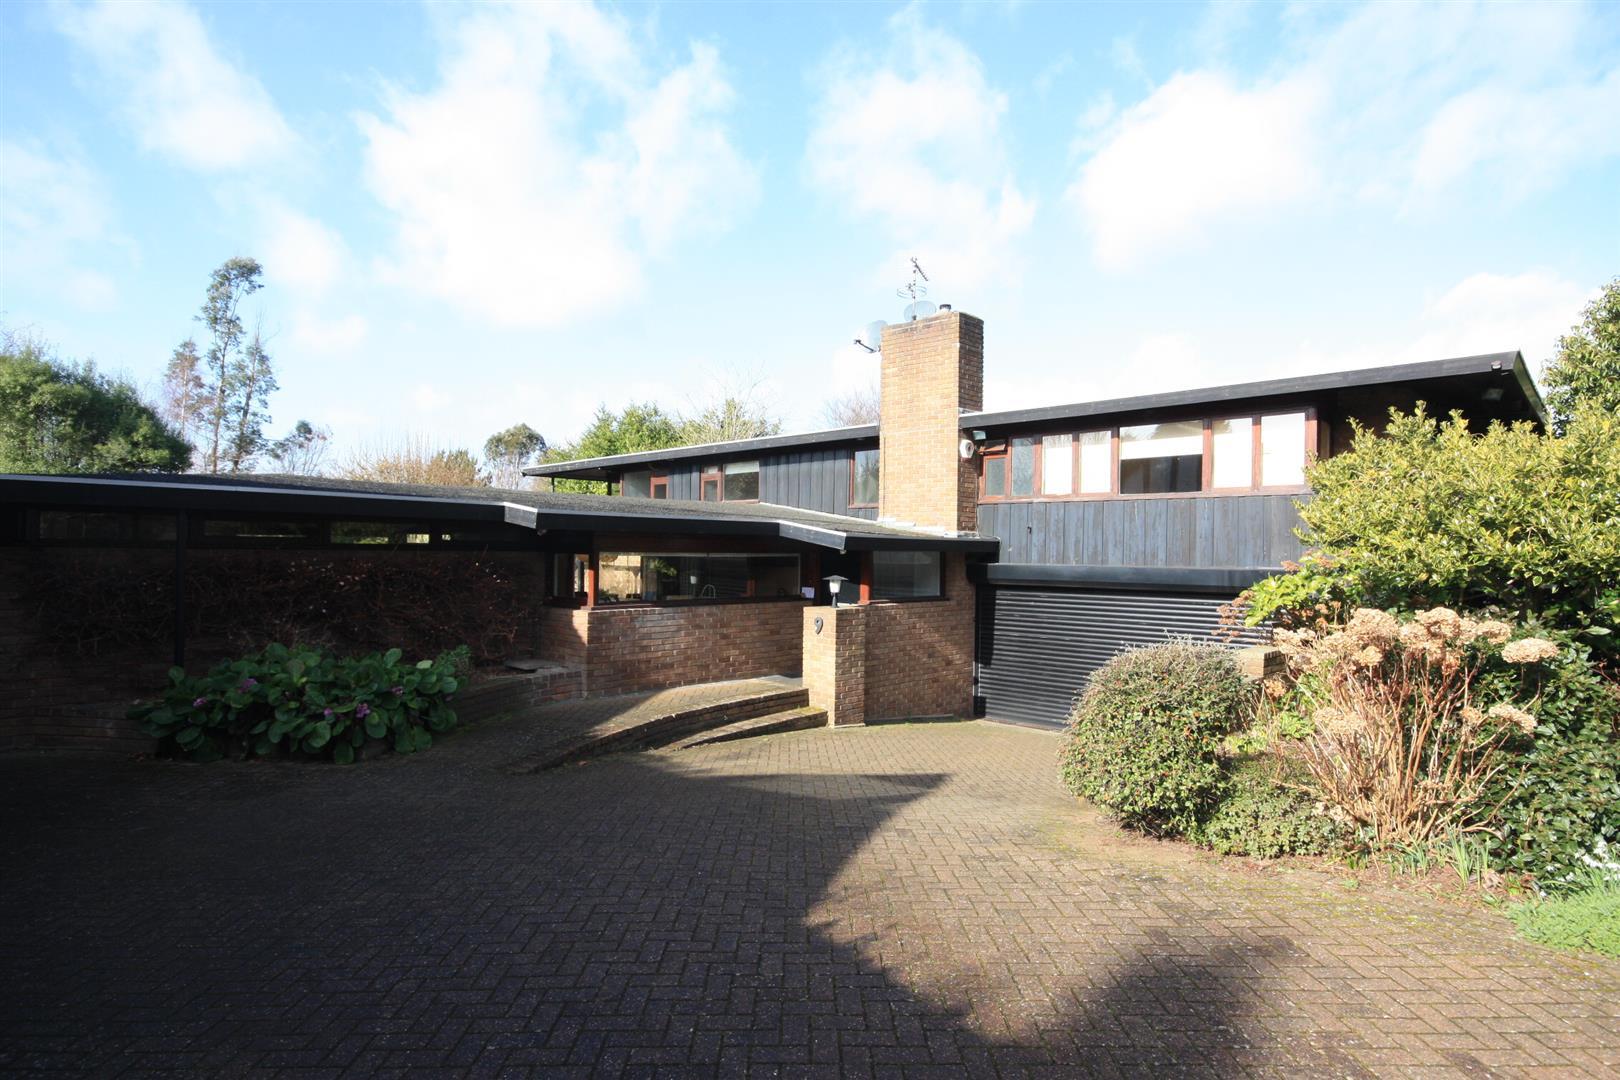 Gibbet Hill Road, Coventry, CV4